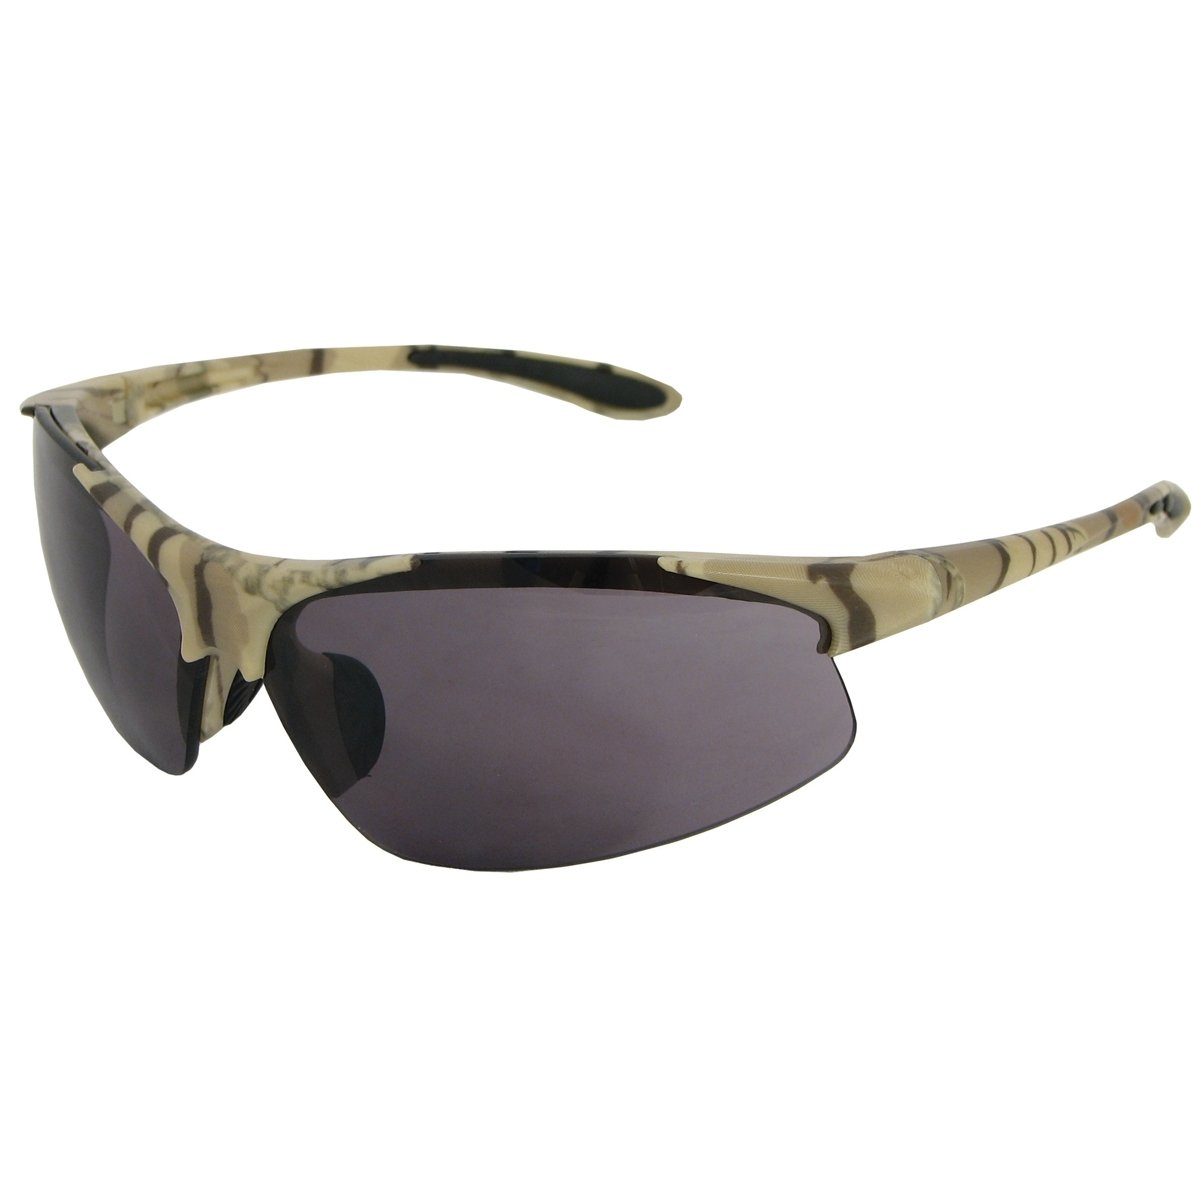 bc7703ea046 ERB Safety 039-18615 Commandos Safety Glasses